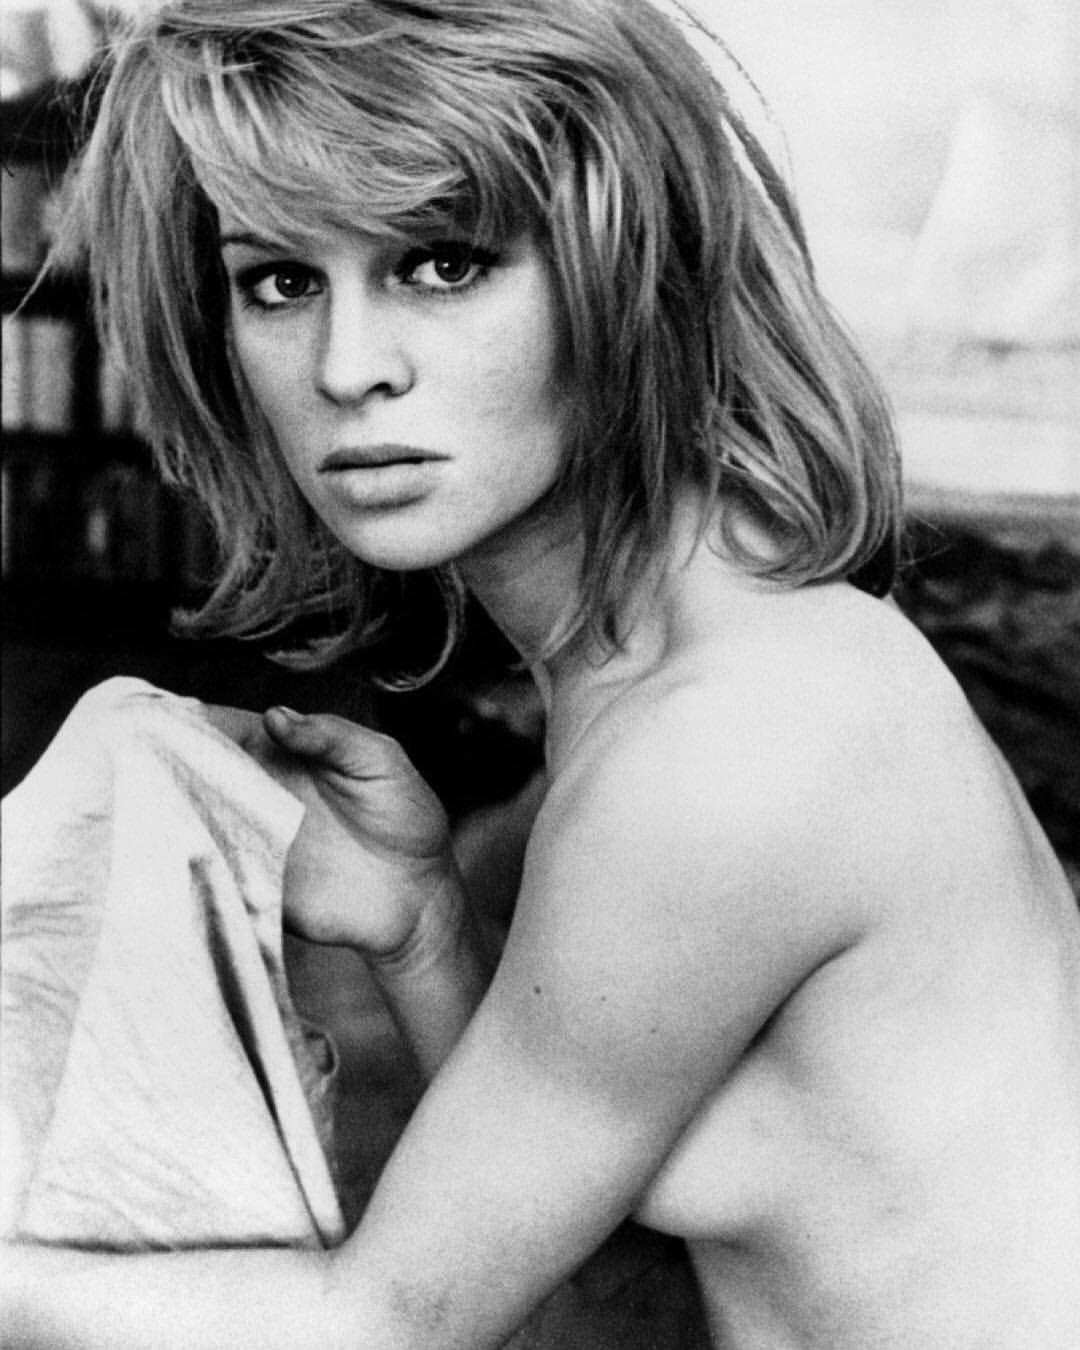 Julie Christie (born 1940 (born in Chabua, India) nude photos 2019